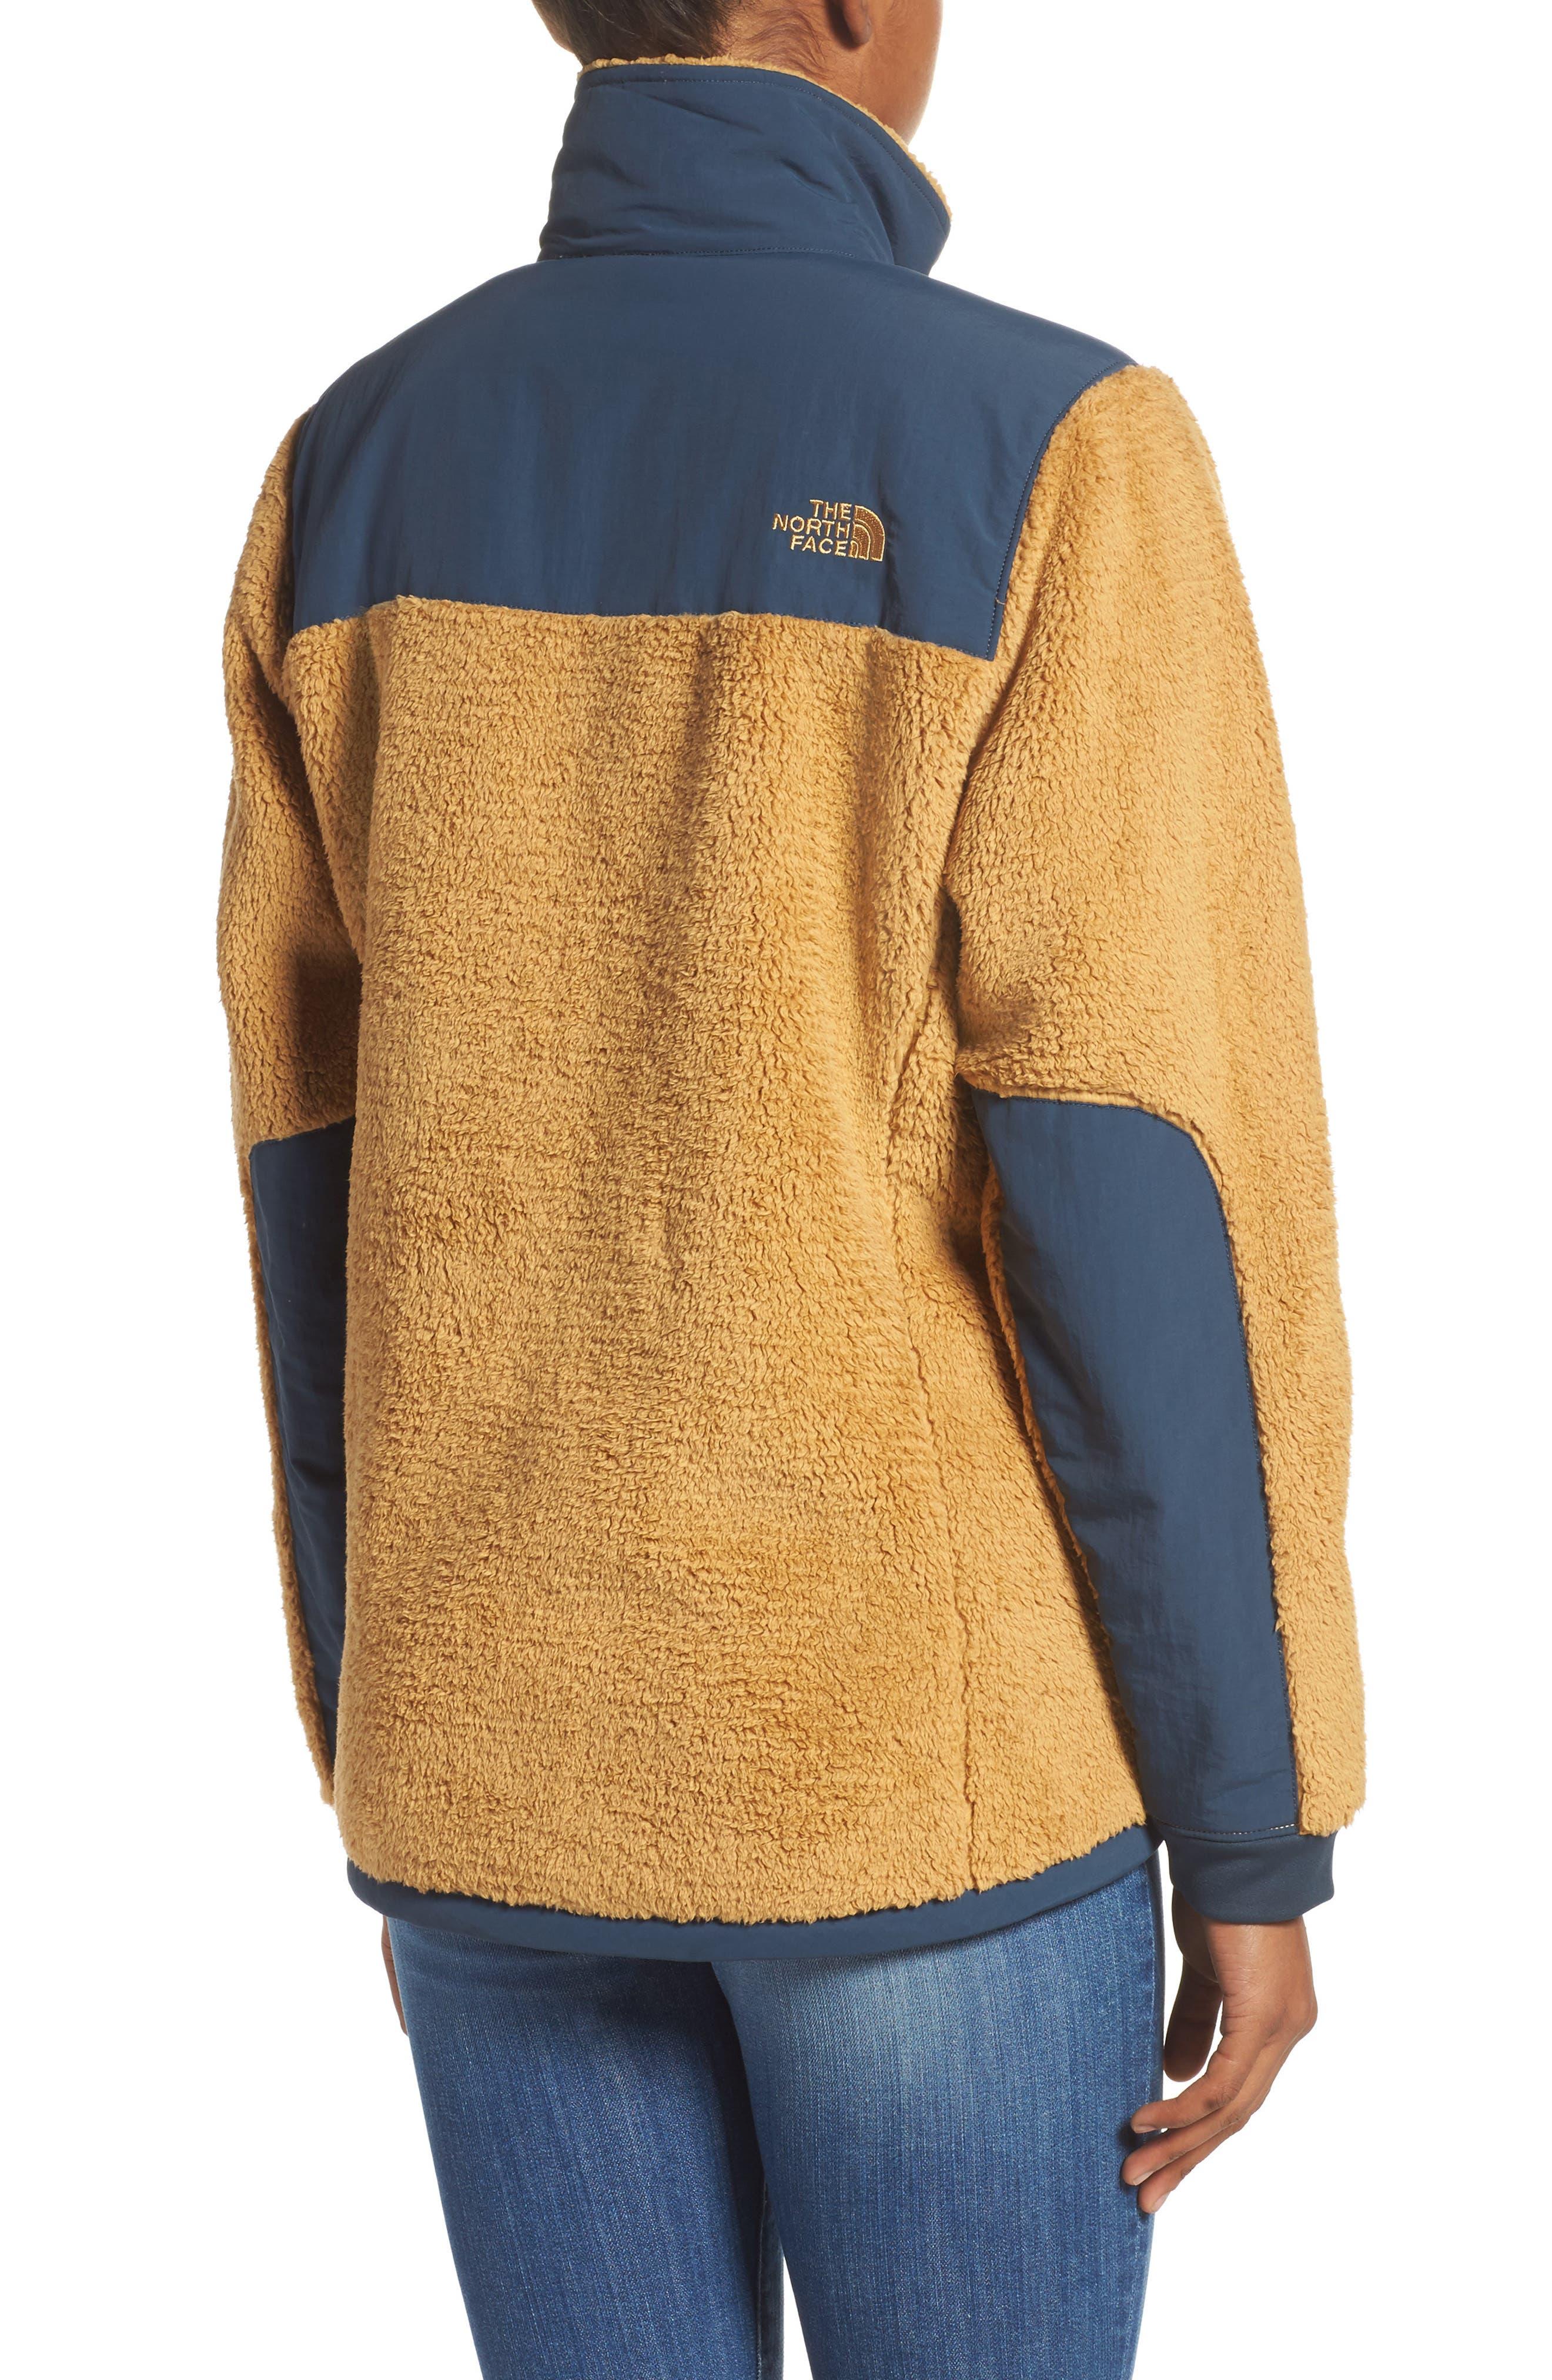 Novelty Denali Fleece Jacket,                             Alternate thumbnail 2, color,                             251